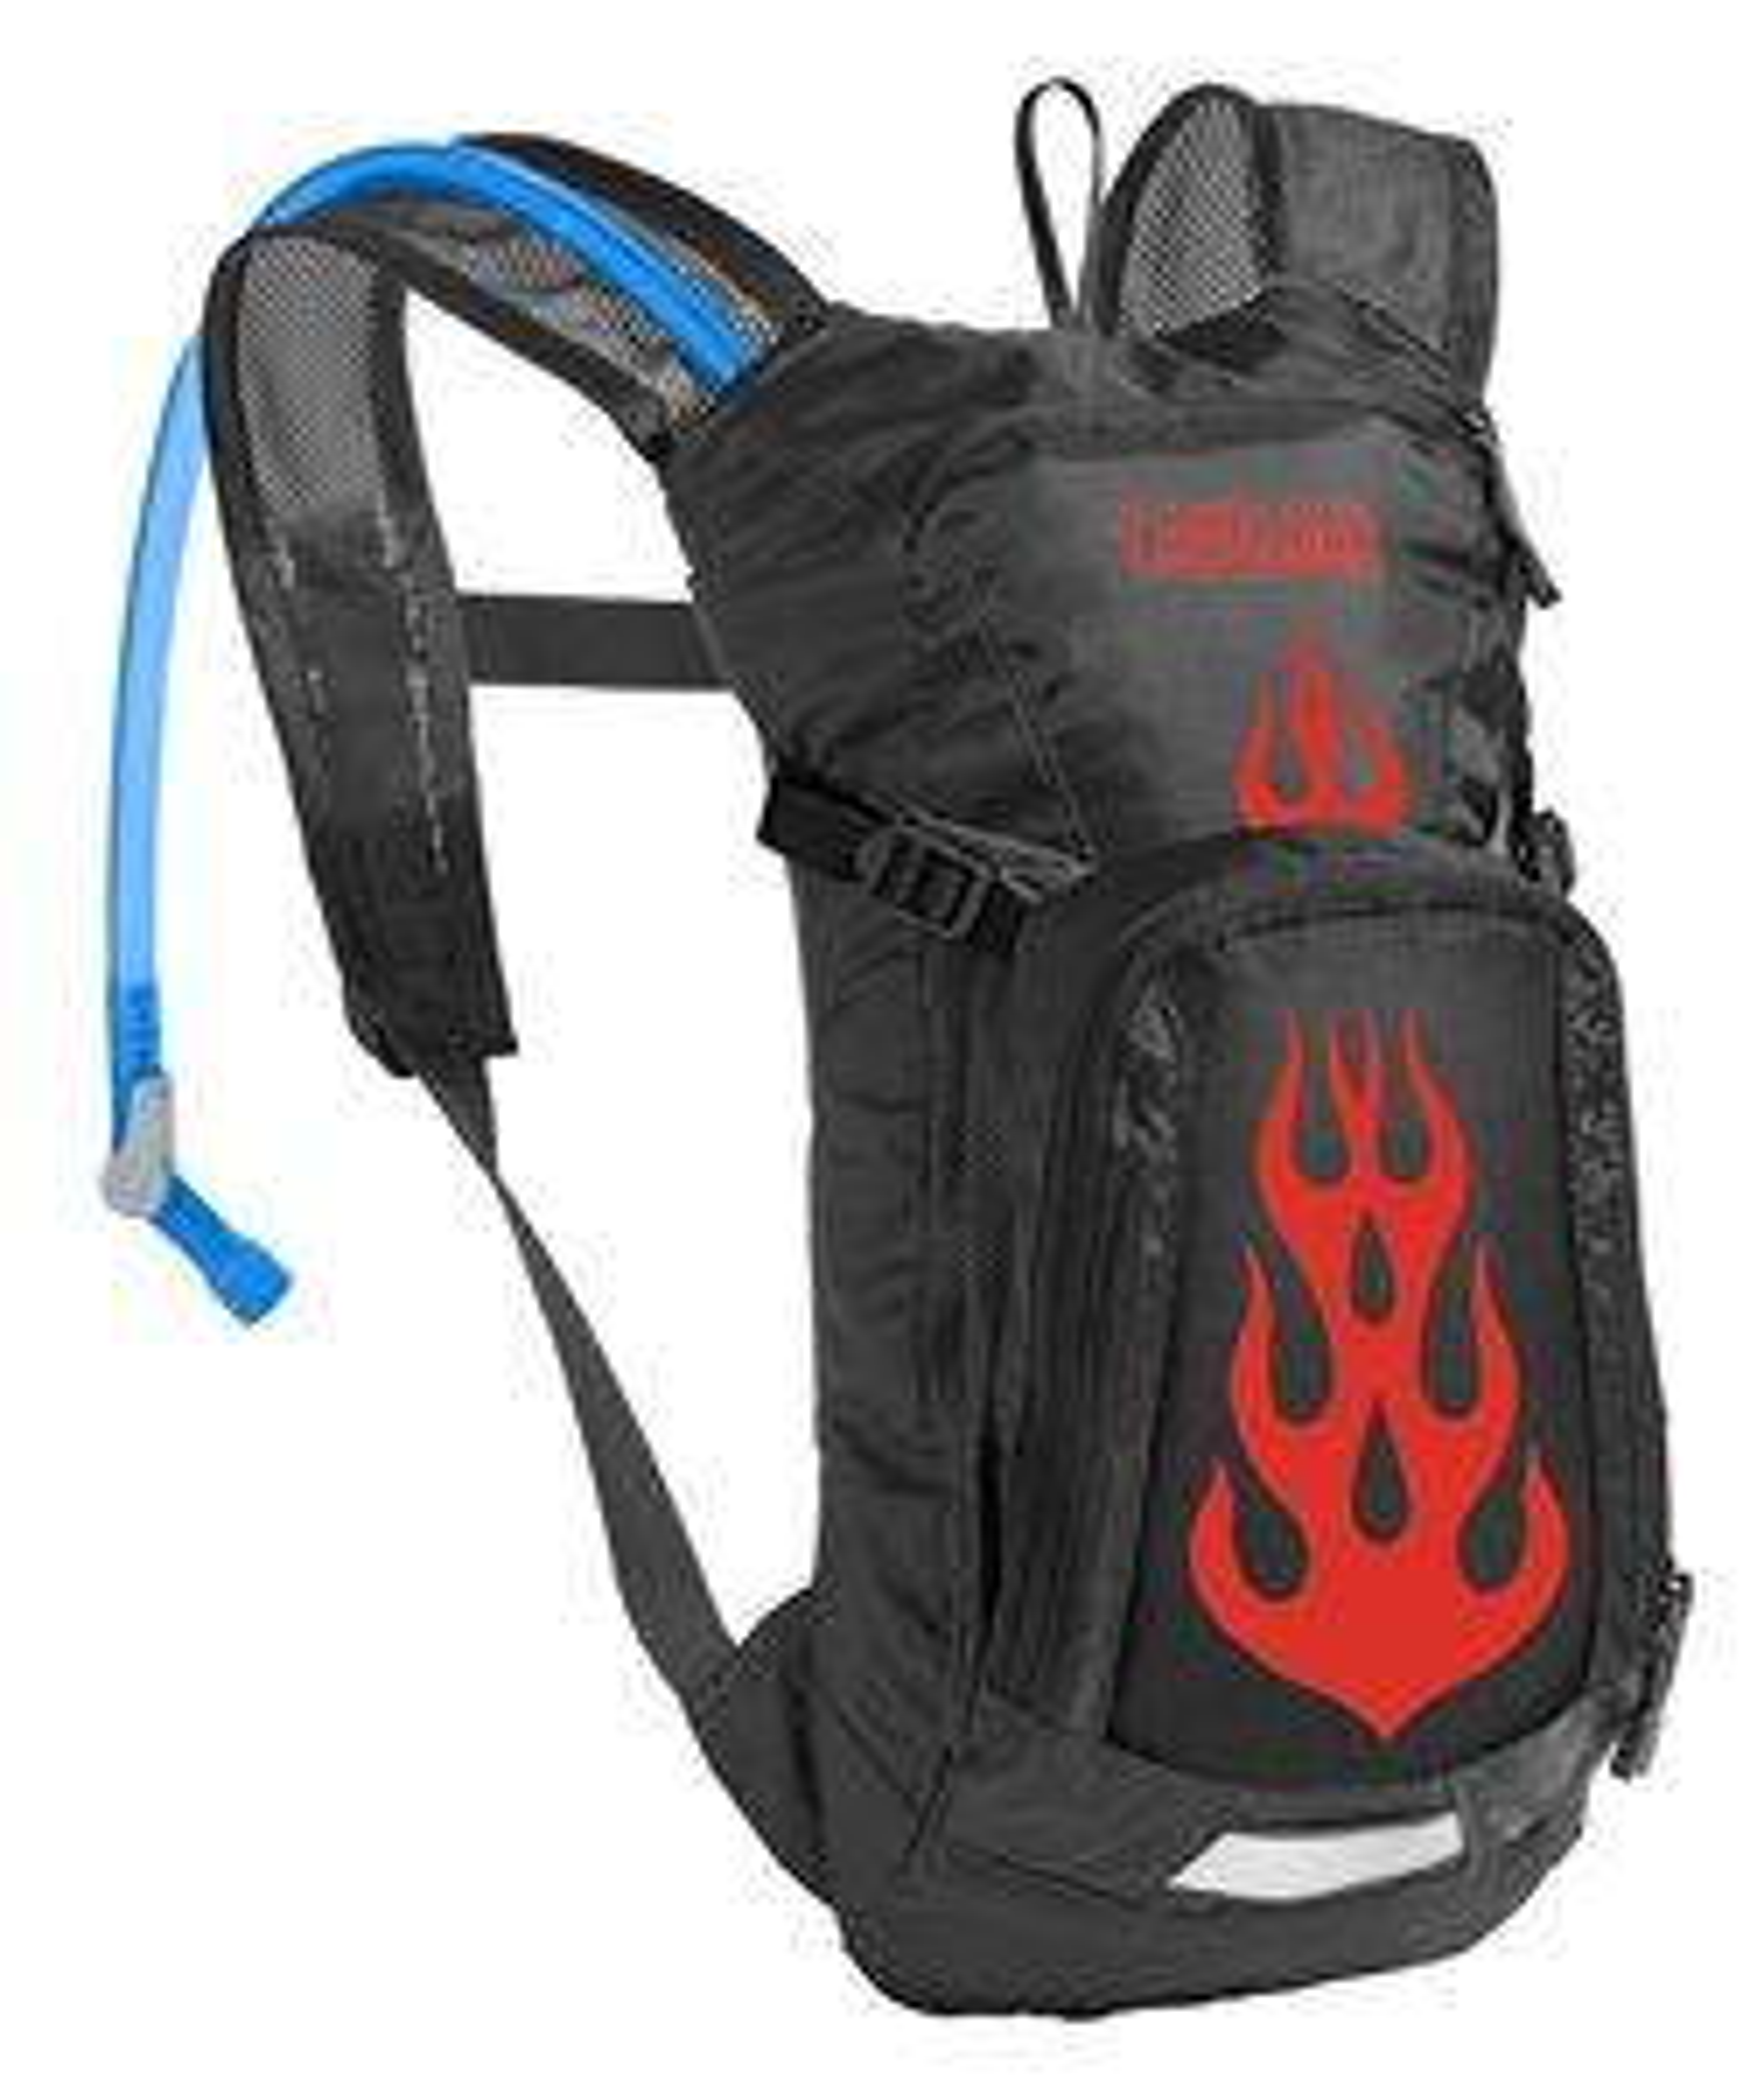 Camelbak Mini M.U.L.E. Pack Black/Flames